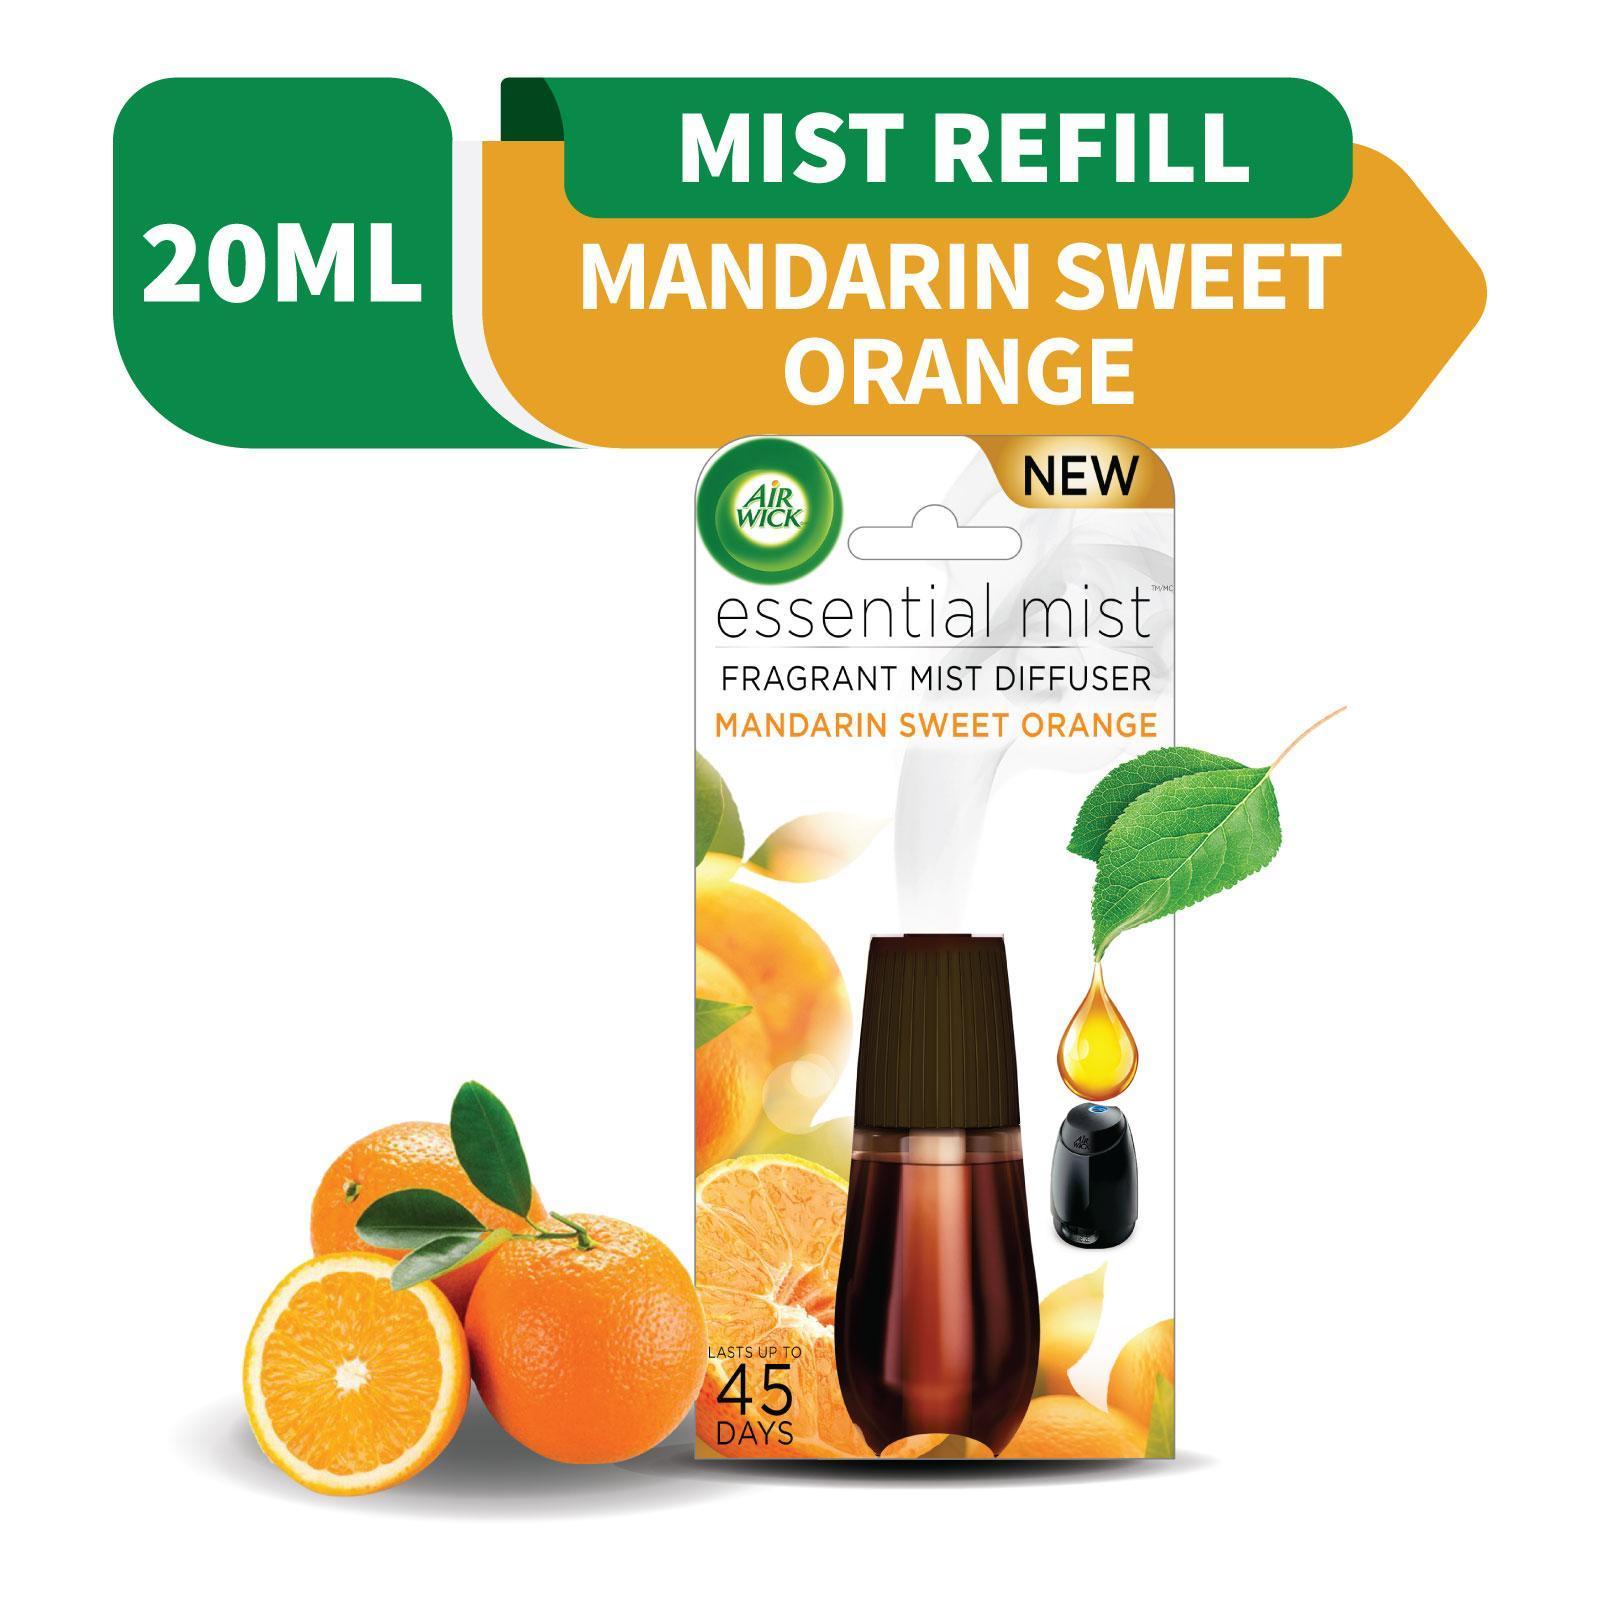 Air Wick Mandarin Sweet Orange Essential Mist Fragrance Diffuser Refill